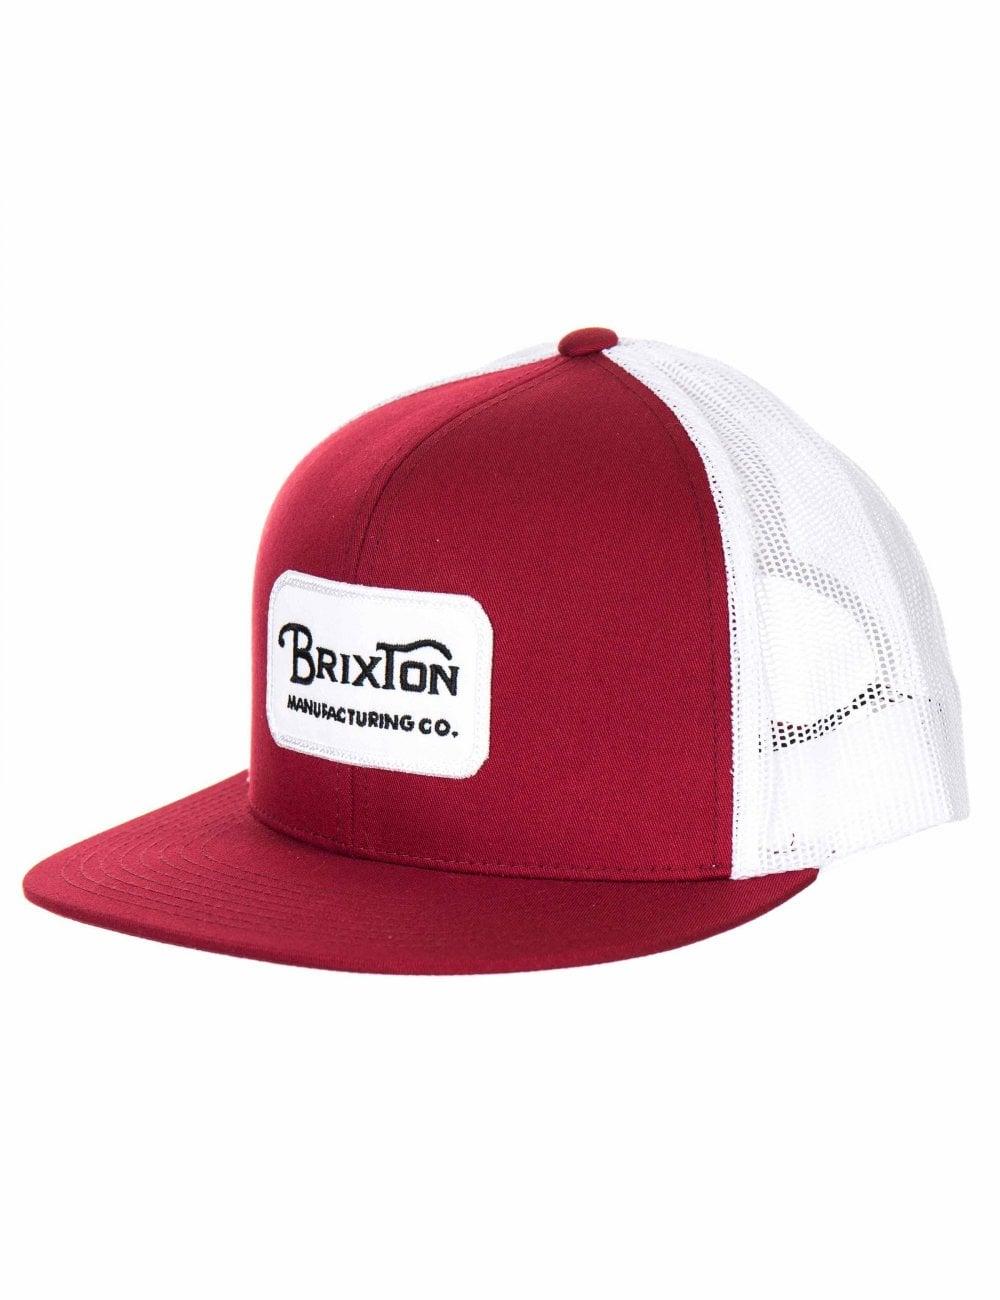 c3ce5c76e2a Brixton Grade Mesh Trucker Hat - Burgundy/White - Accessories from ...